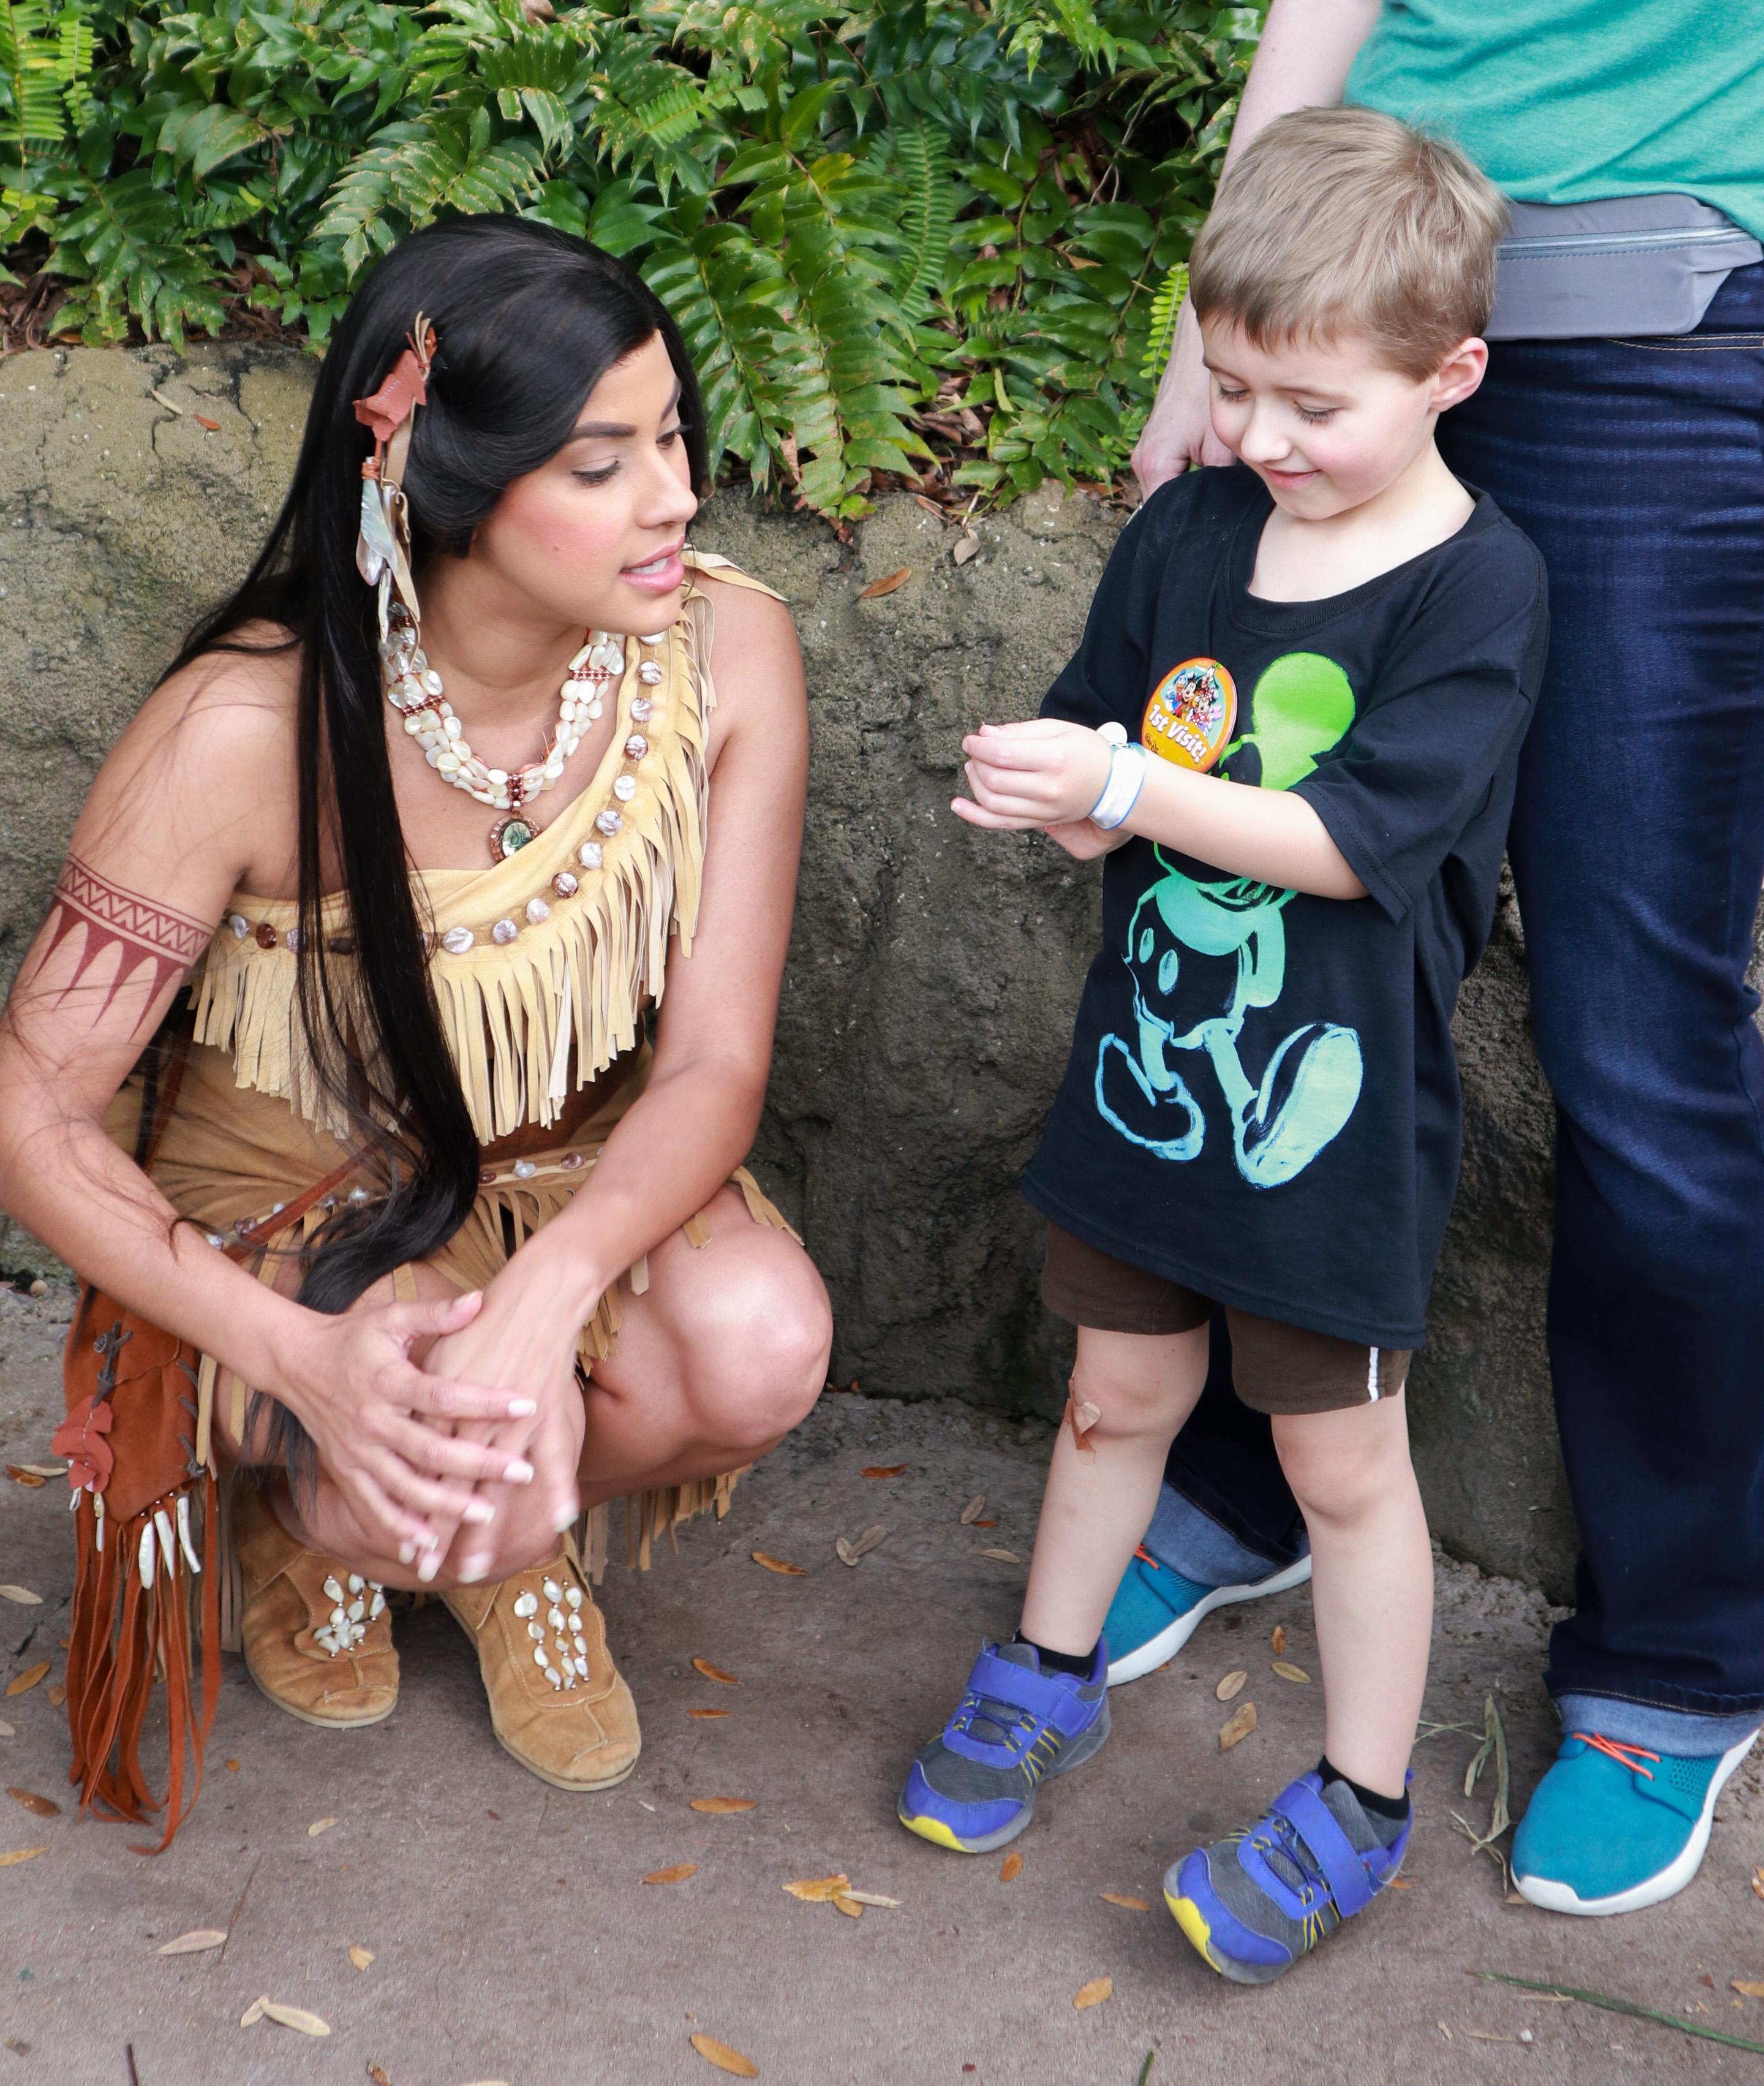 Pocahontas looks at a boy's ID bracelet